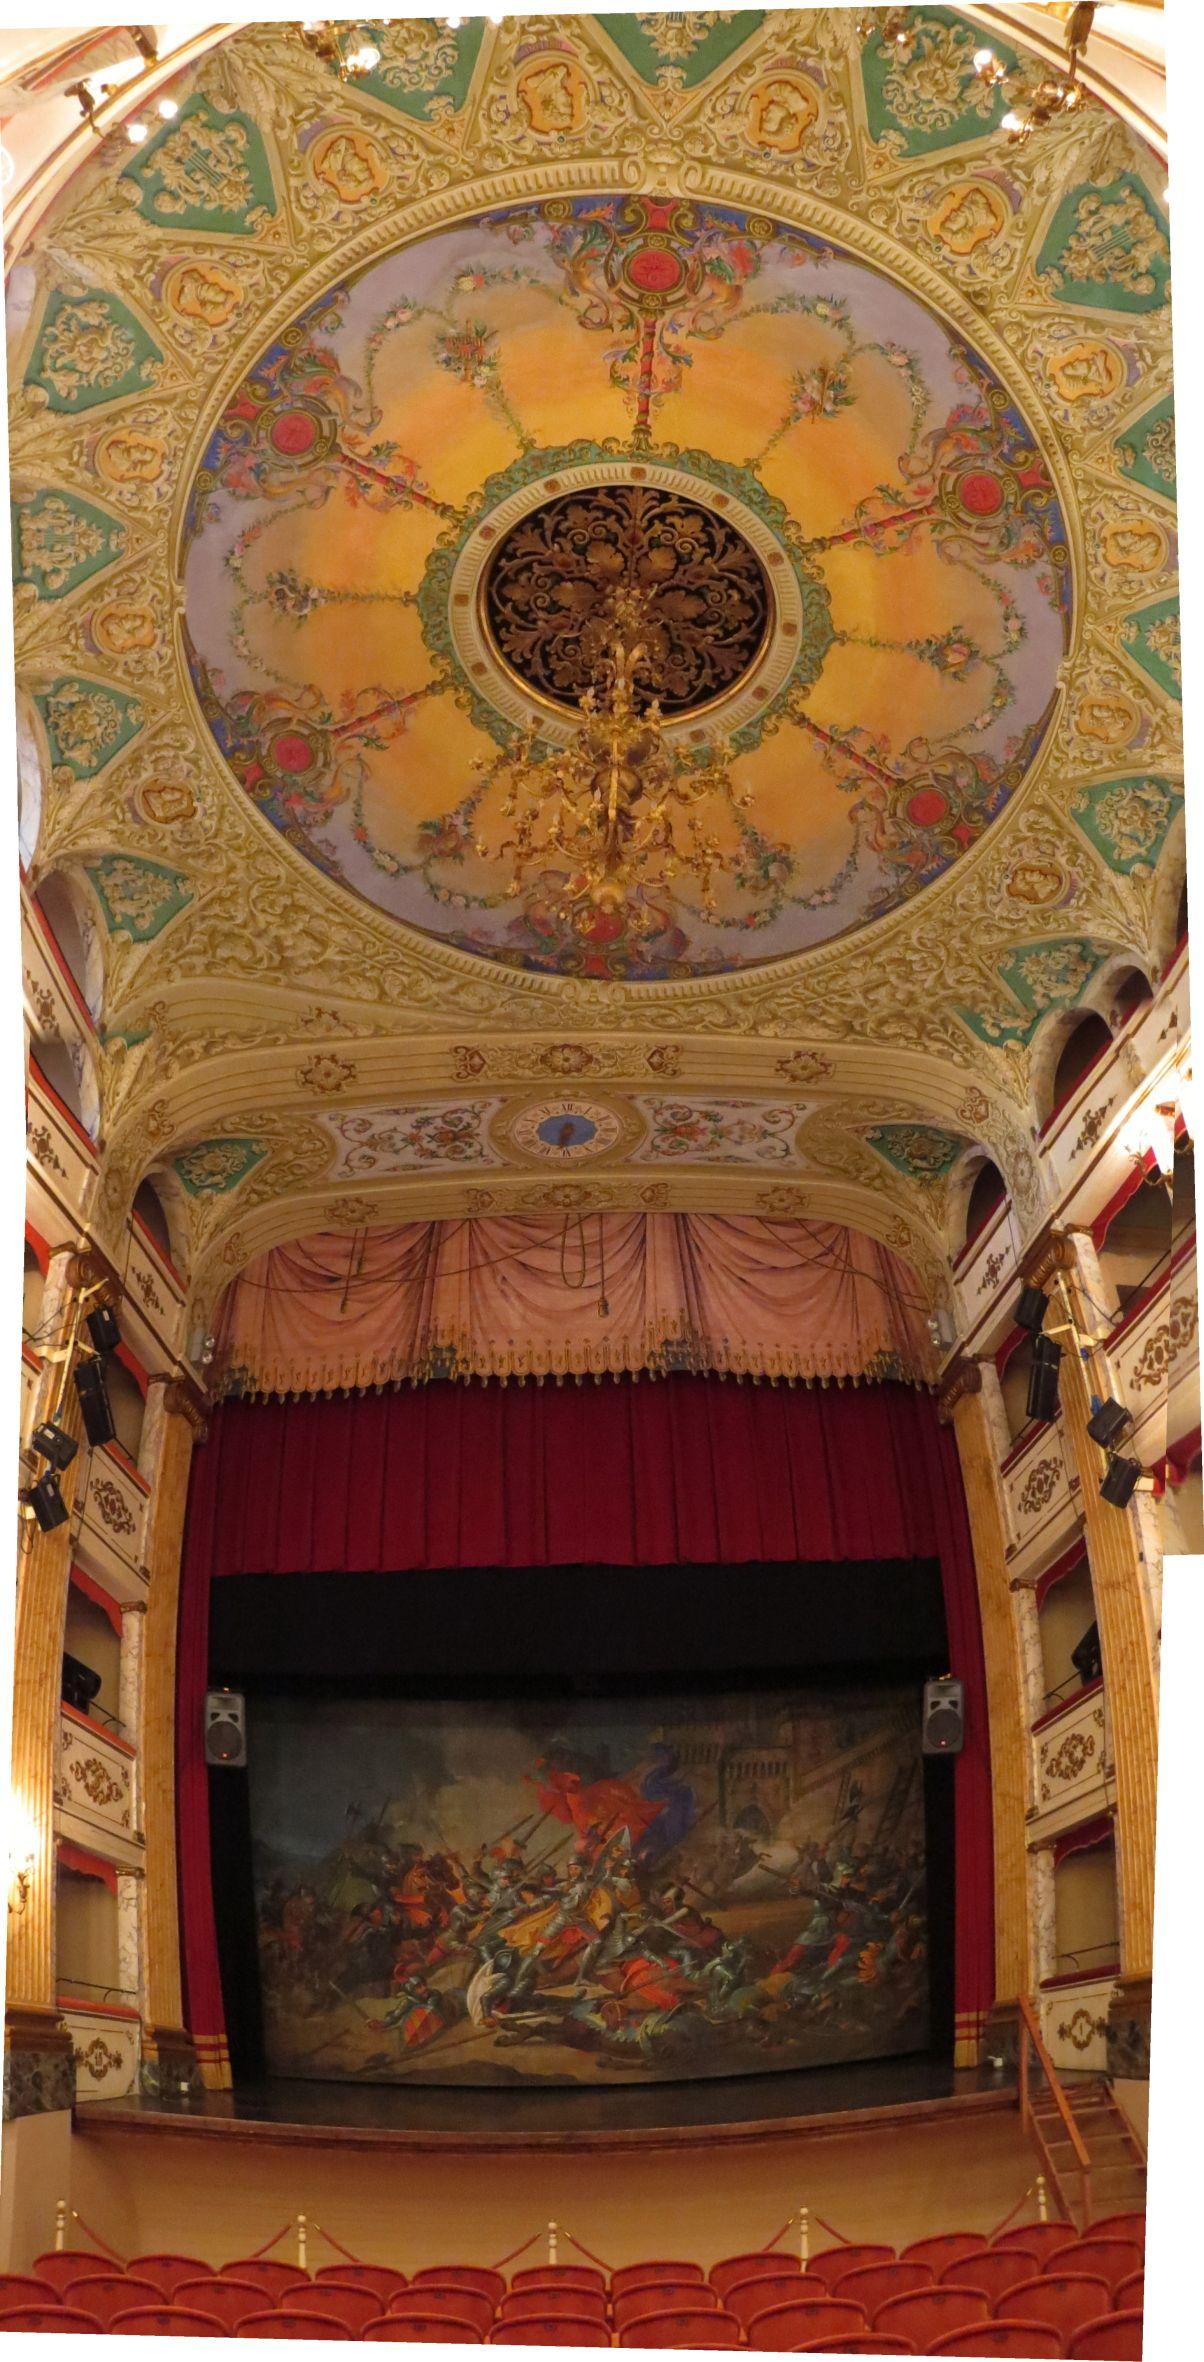 Treia, Marche, Italy - Teatro Comunale (1800)- Photo by Gianni Del Bufalo bygdb Attribution-ShareAlike 2.0 (CC BY-SA 2.0)